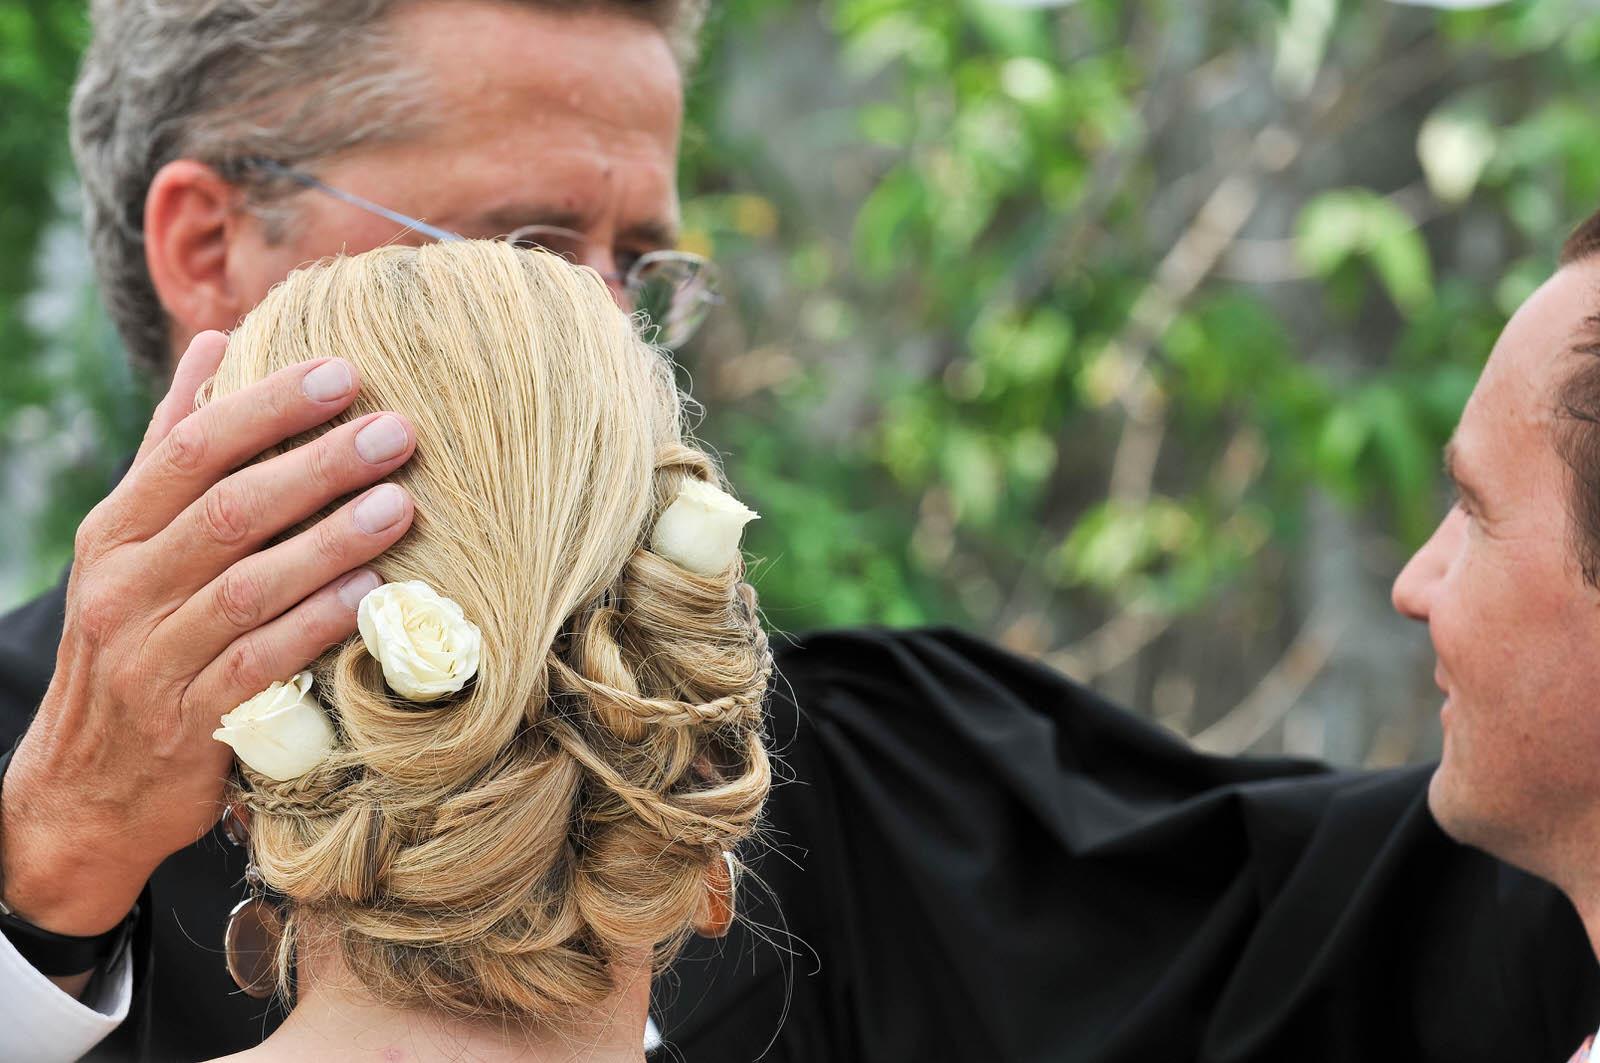 tuscany-wedding-planners-ceremonies-24.jpg